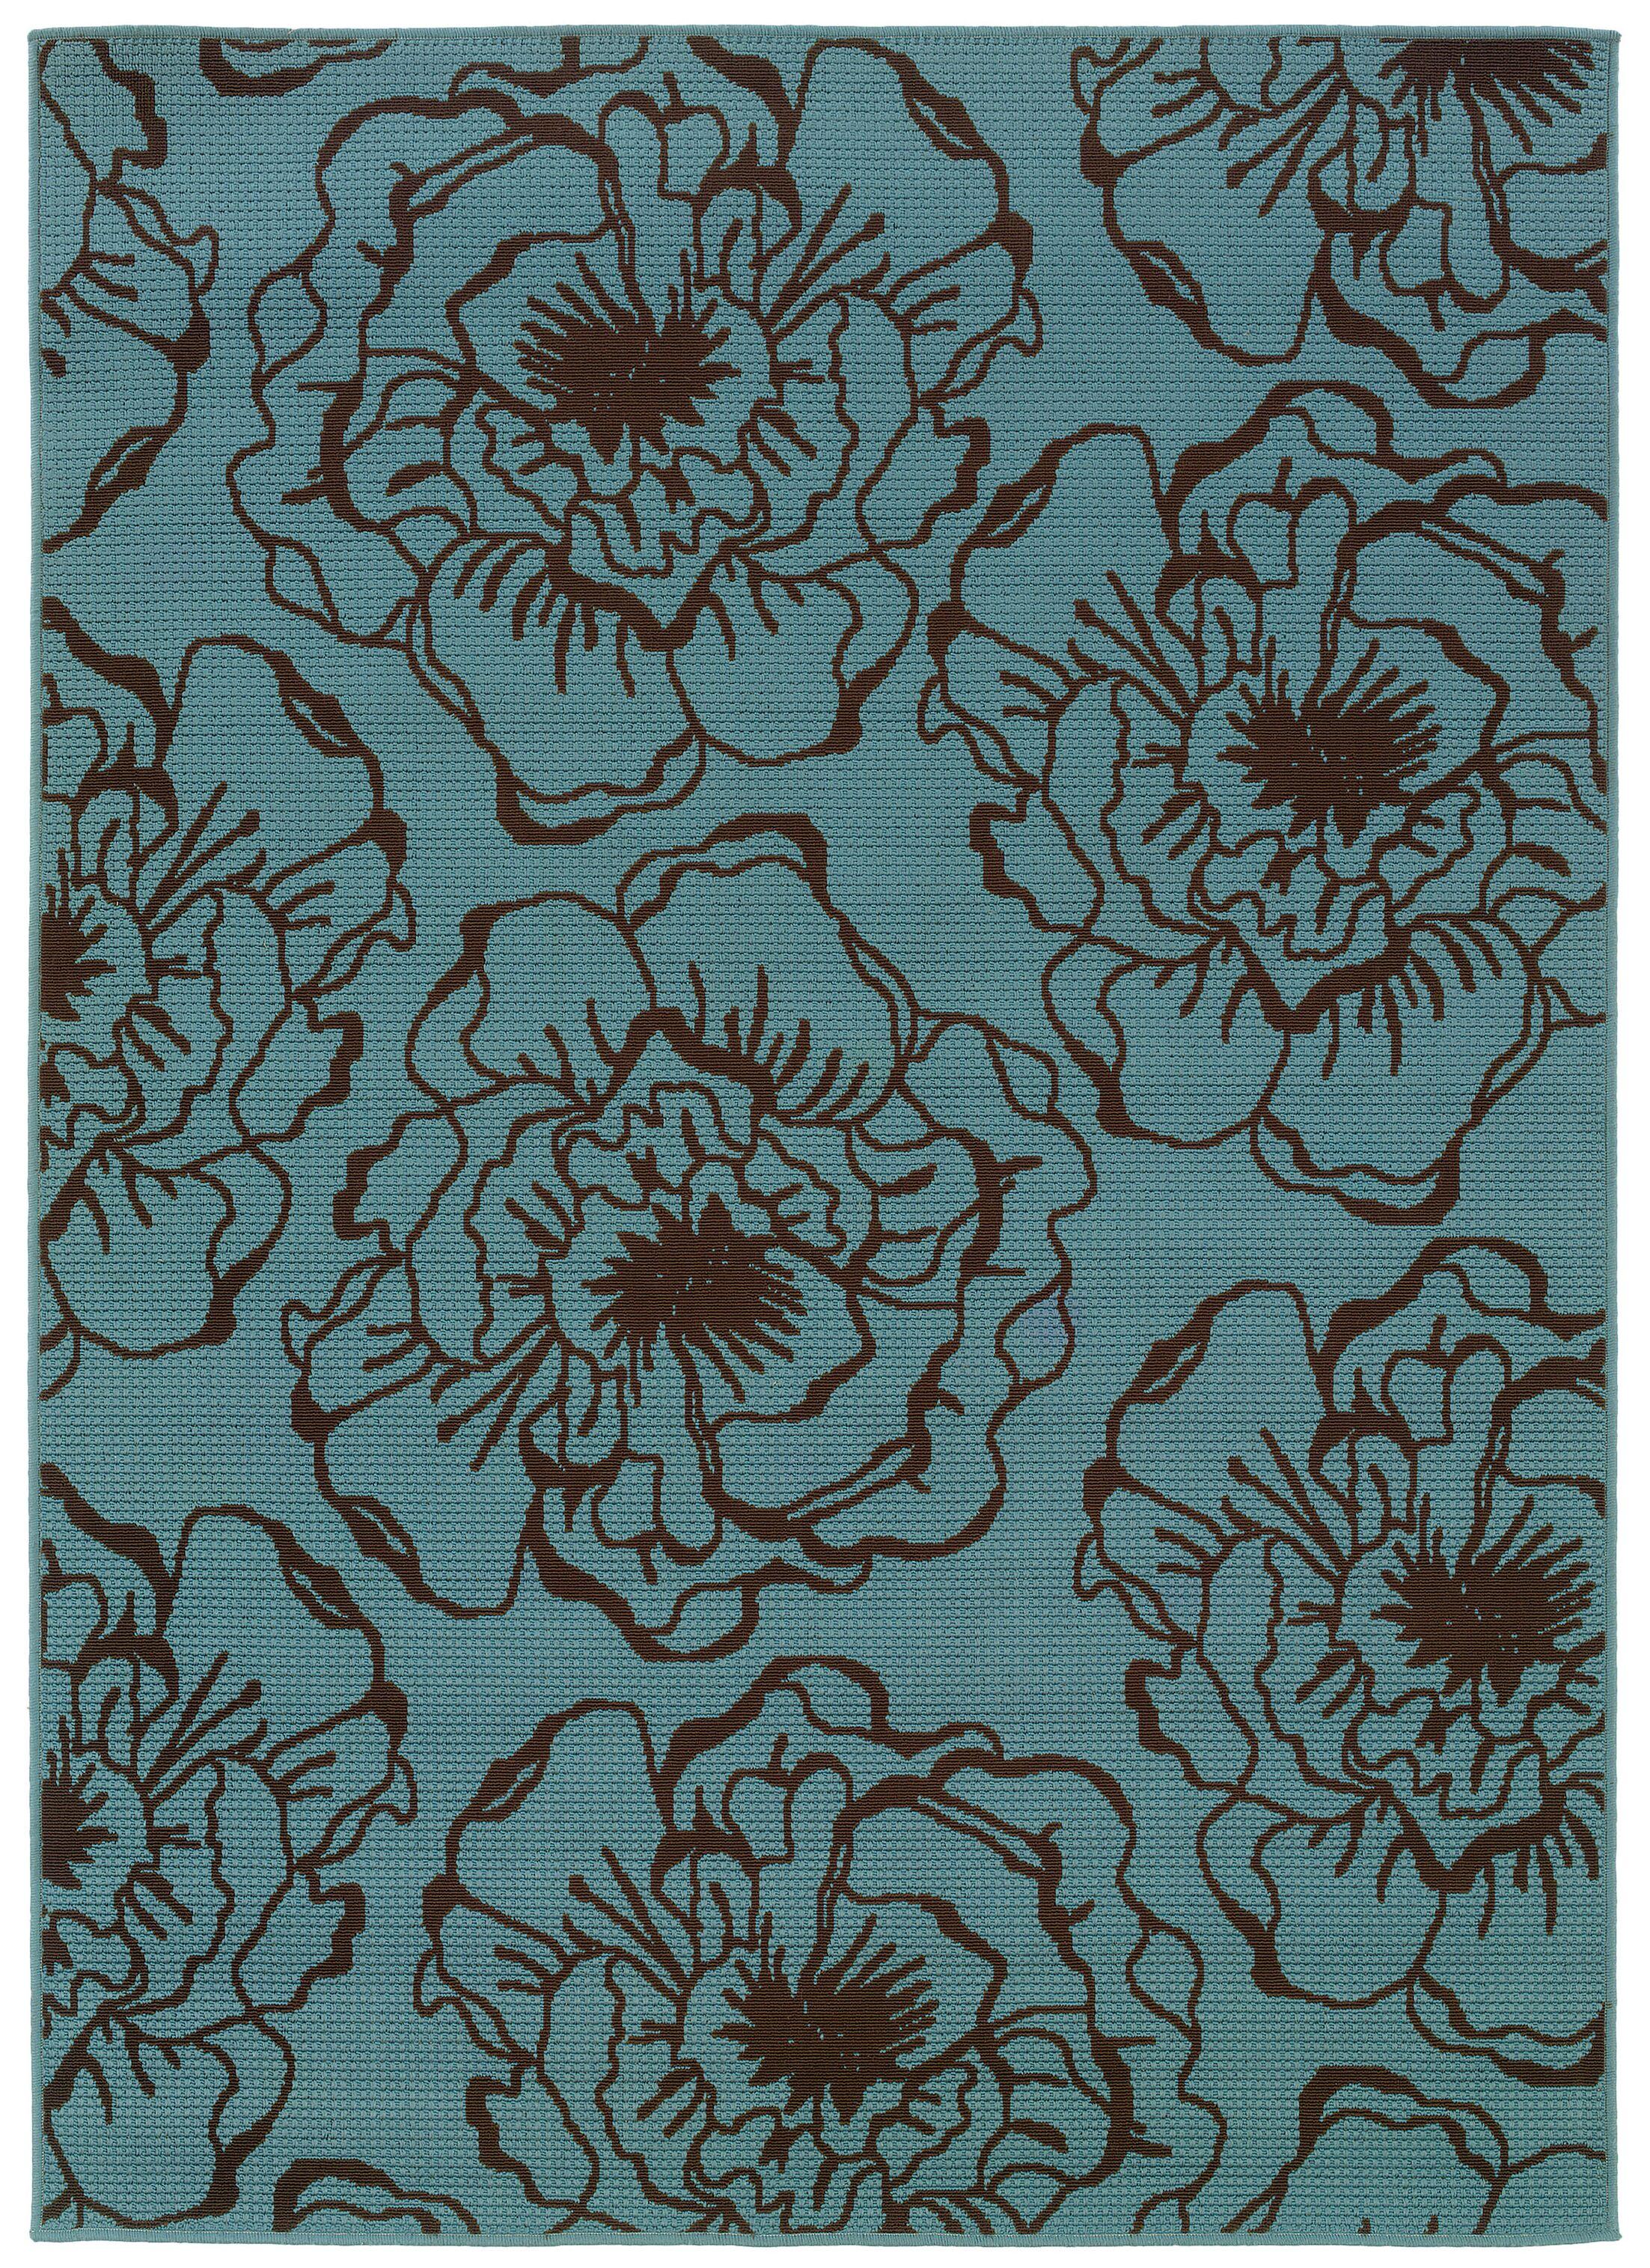 Newfield Blue/Brown Indoor/Outdoor Area Rug Rug Size: Rectangle 6'7